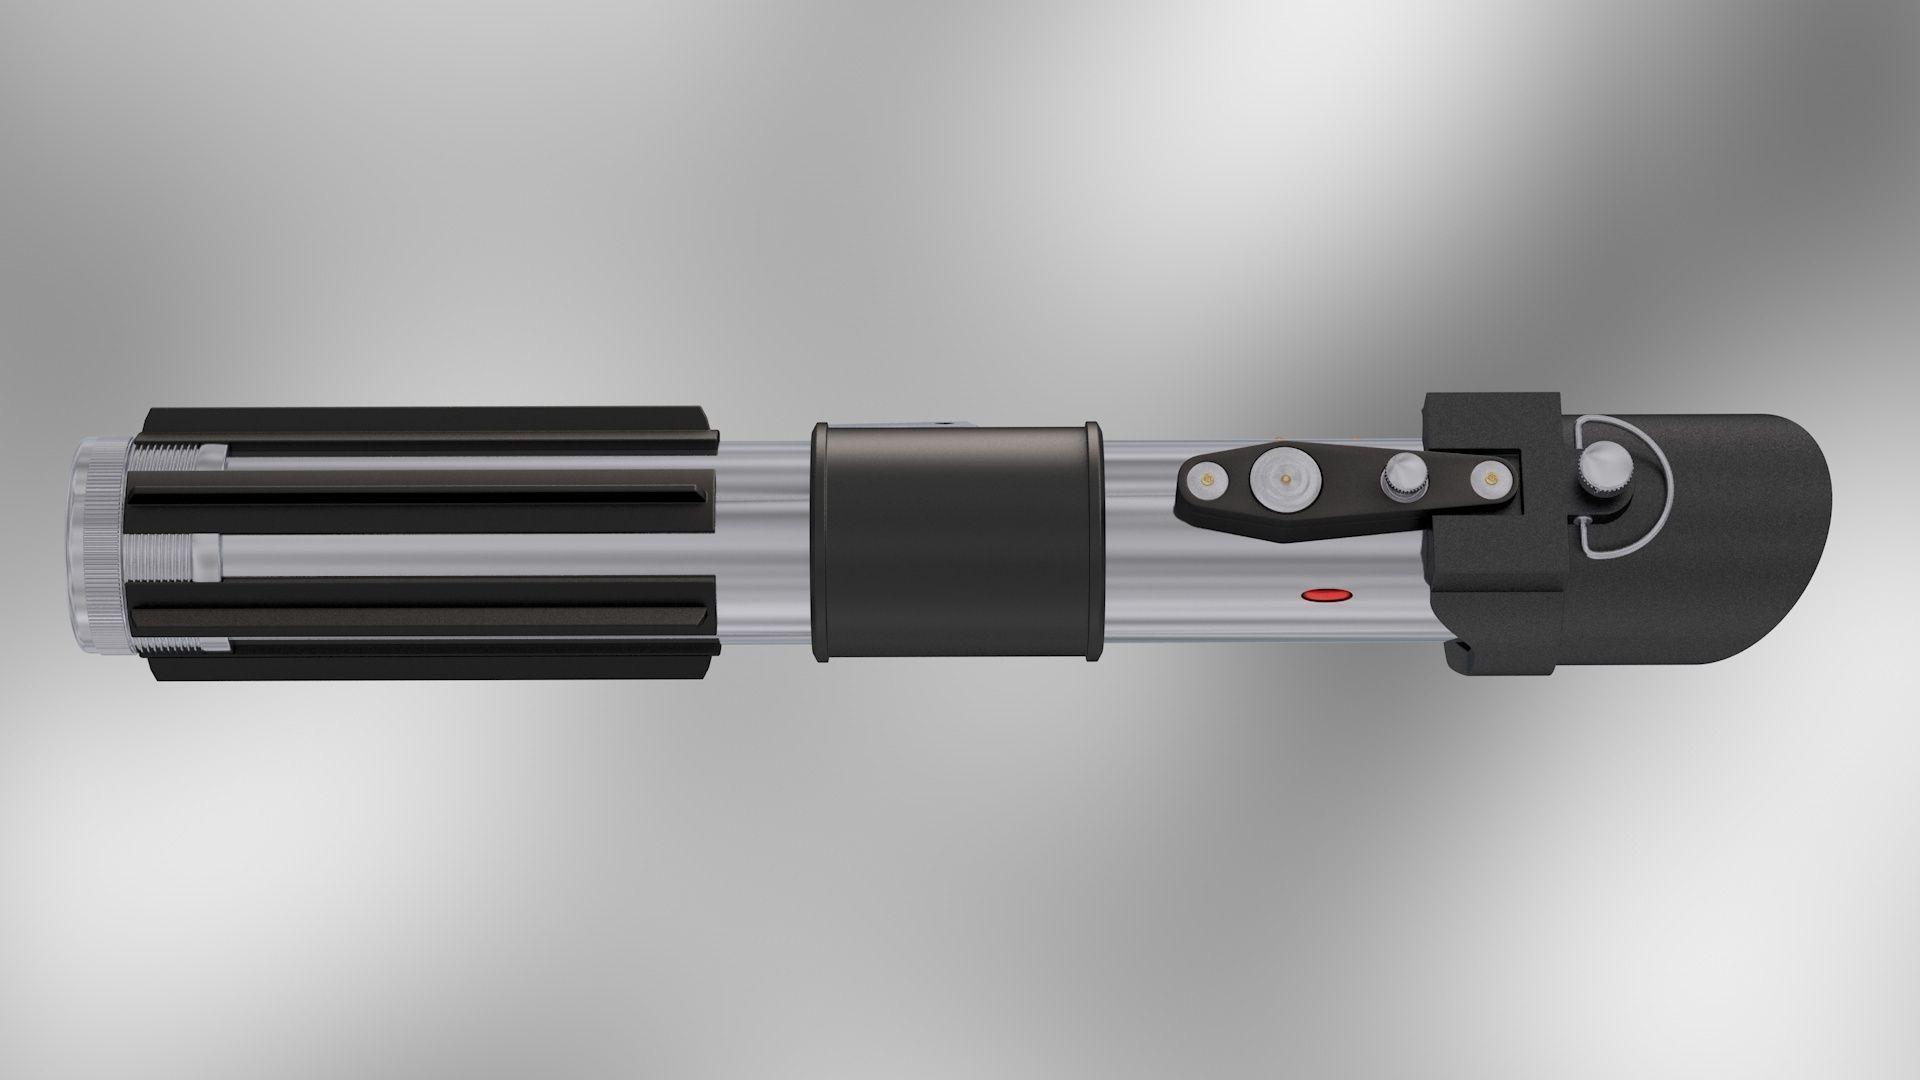 Sith Wallpaper Hd Darth Vader Lightsaber 3d Model Rigged Obj 3ds C4d